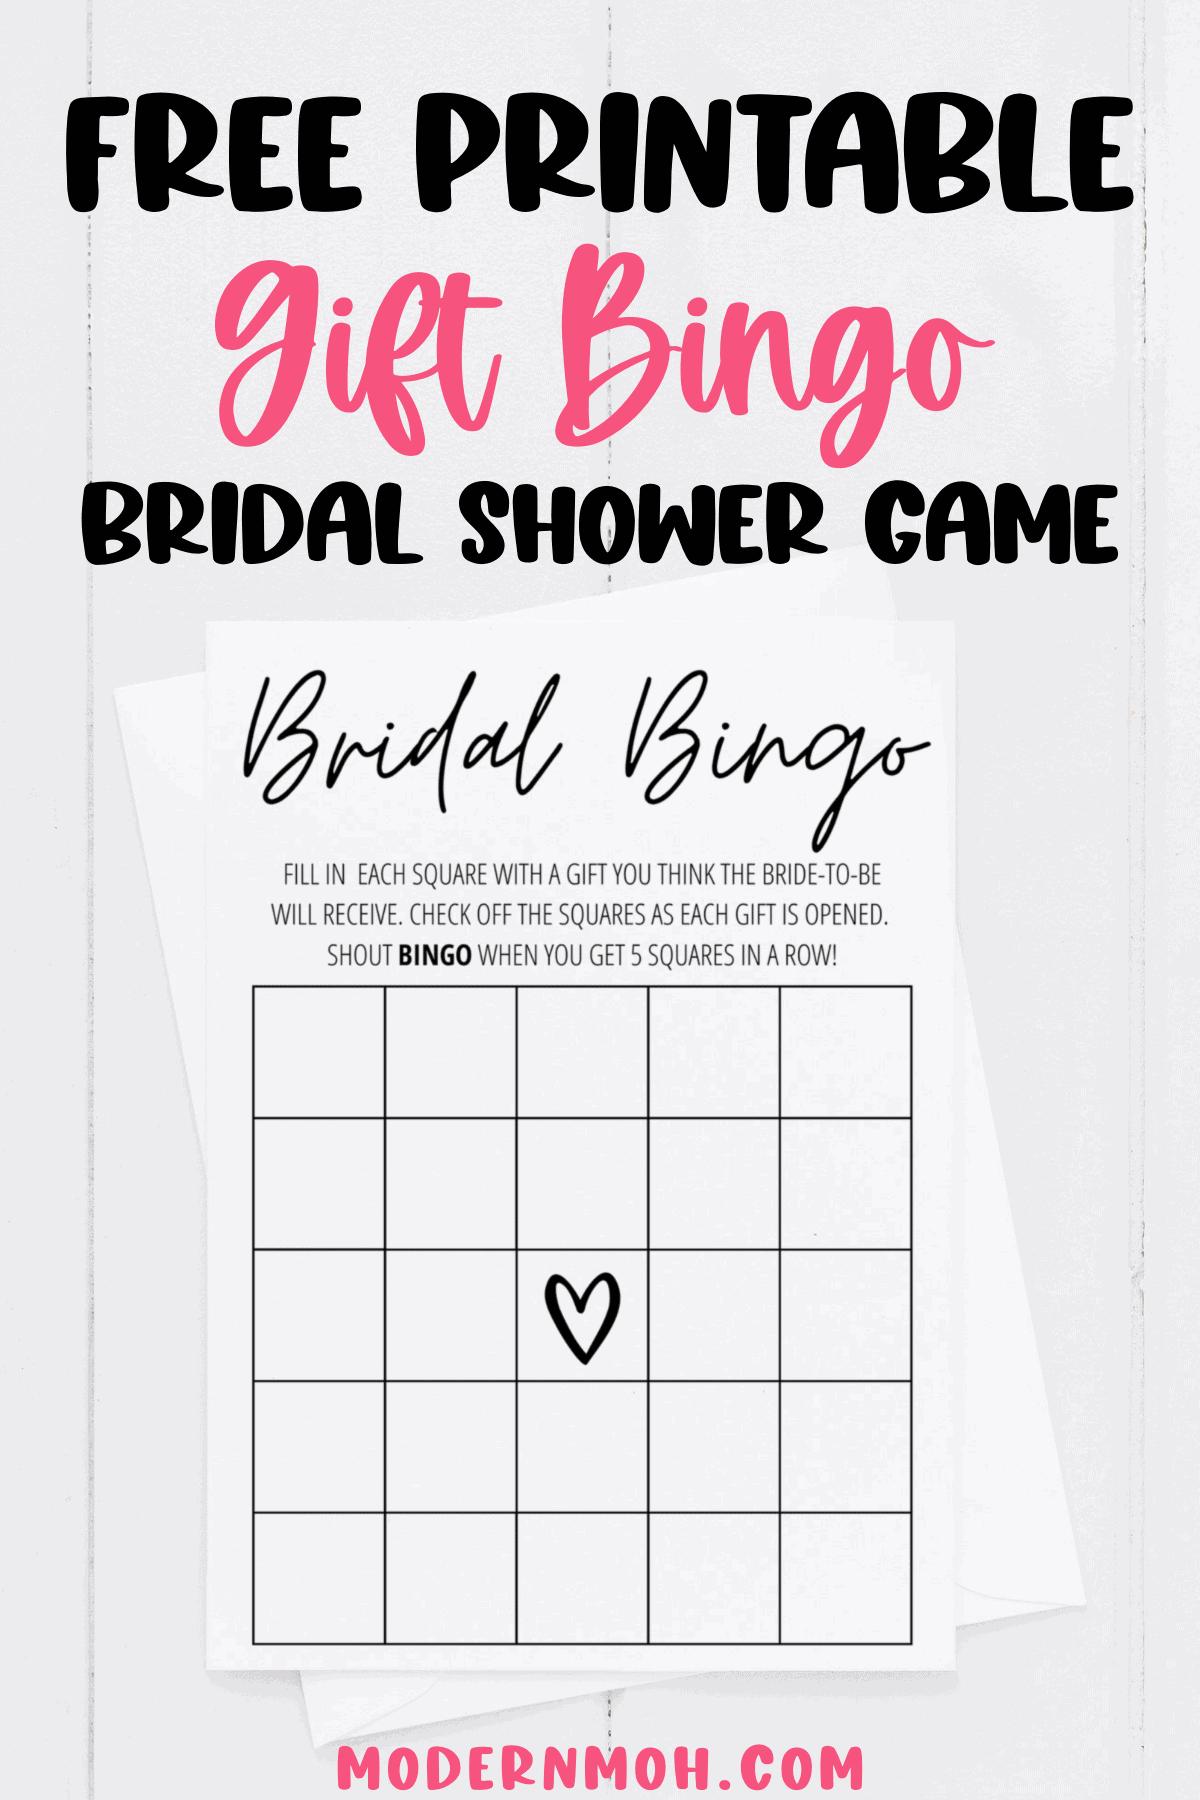 Bridal Shower Bingo Free Printable